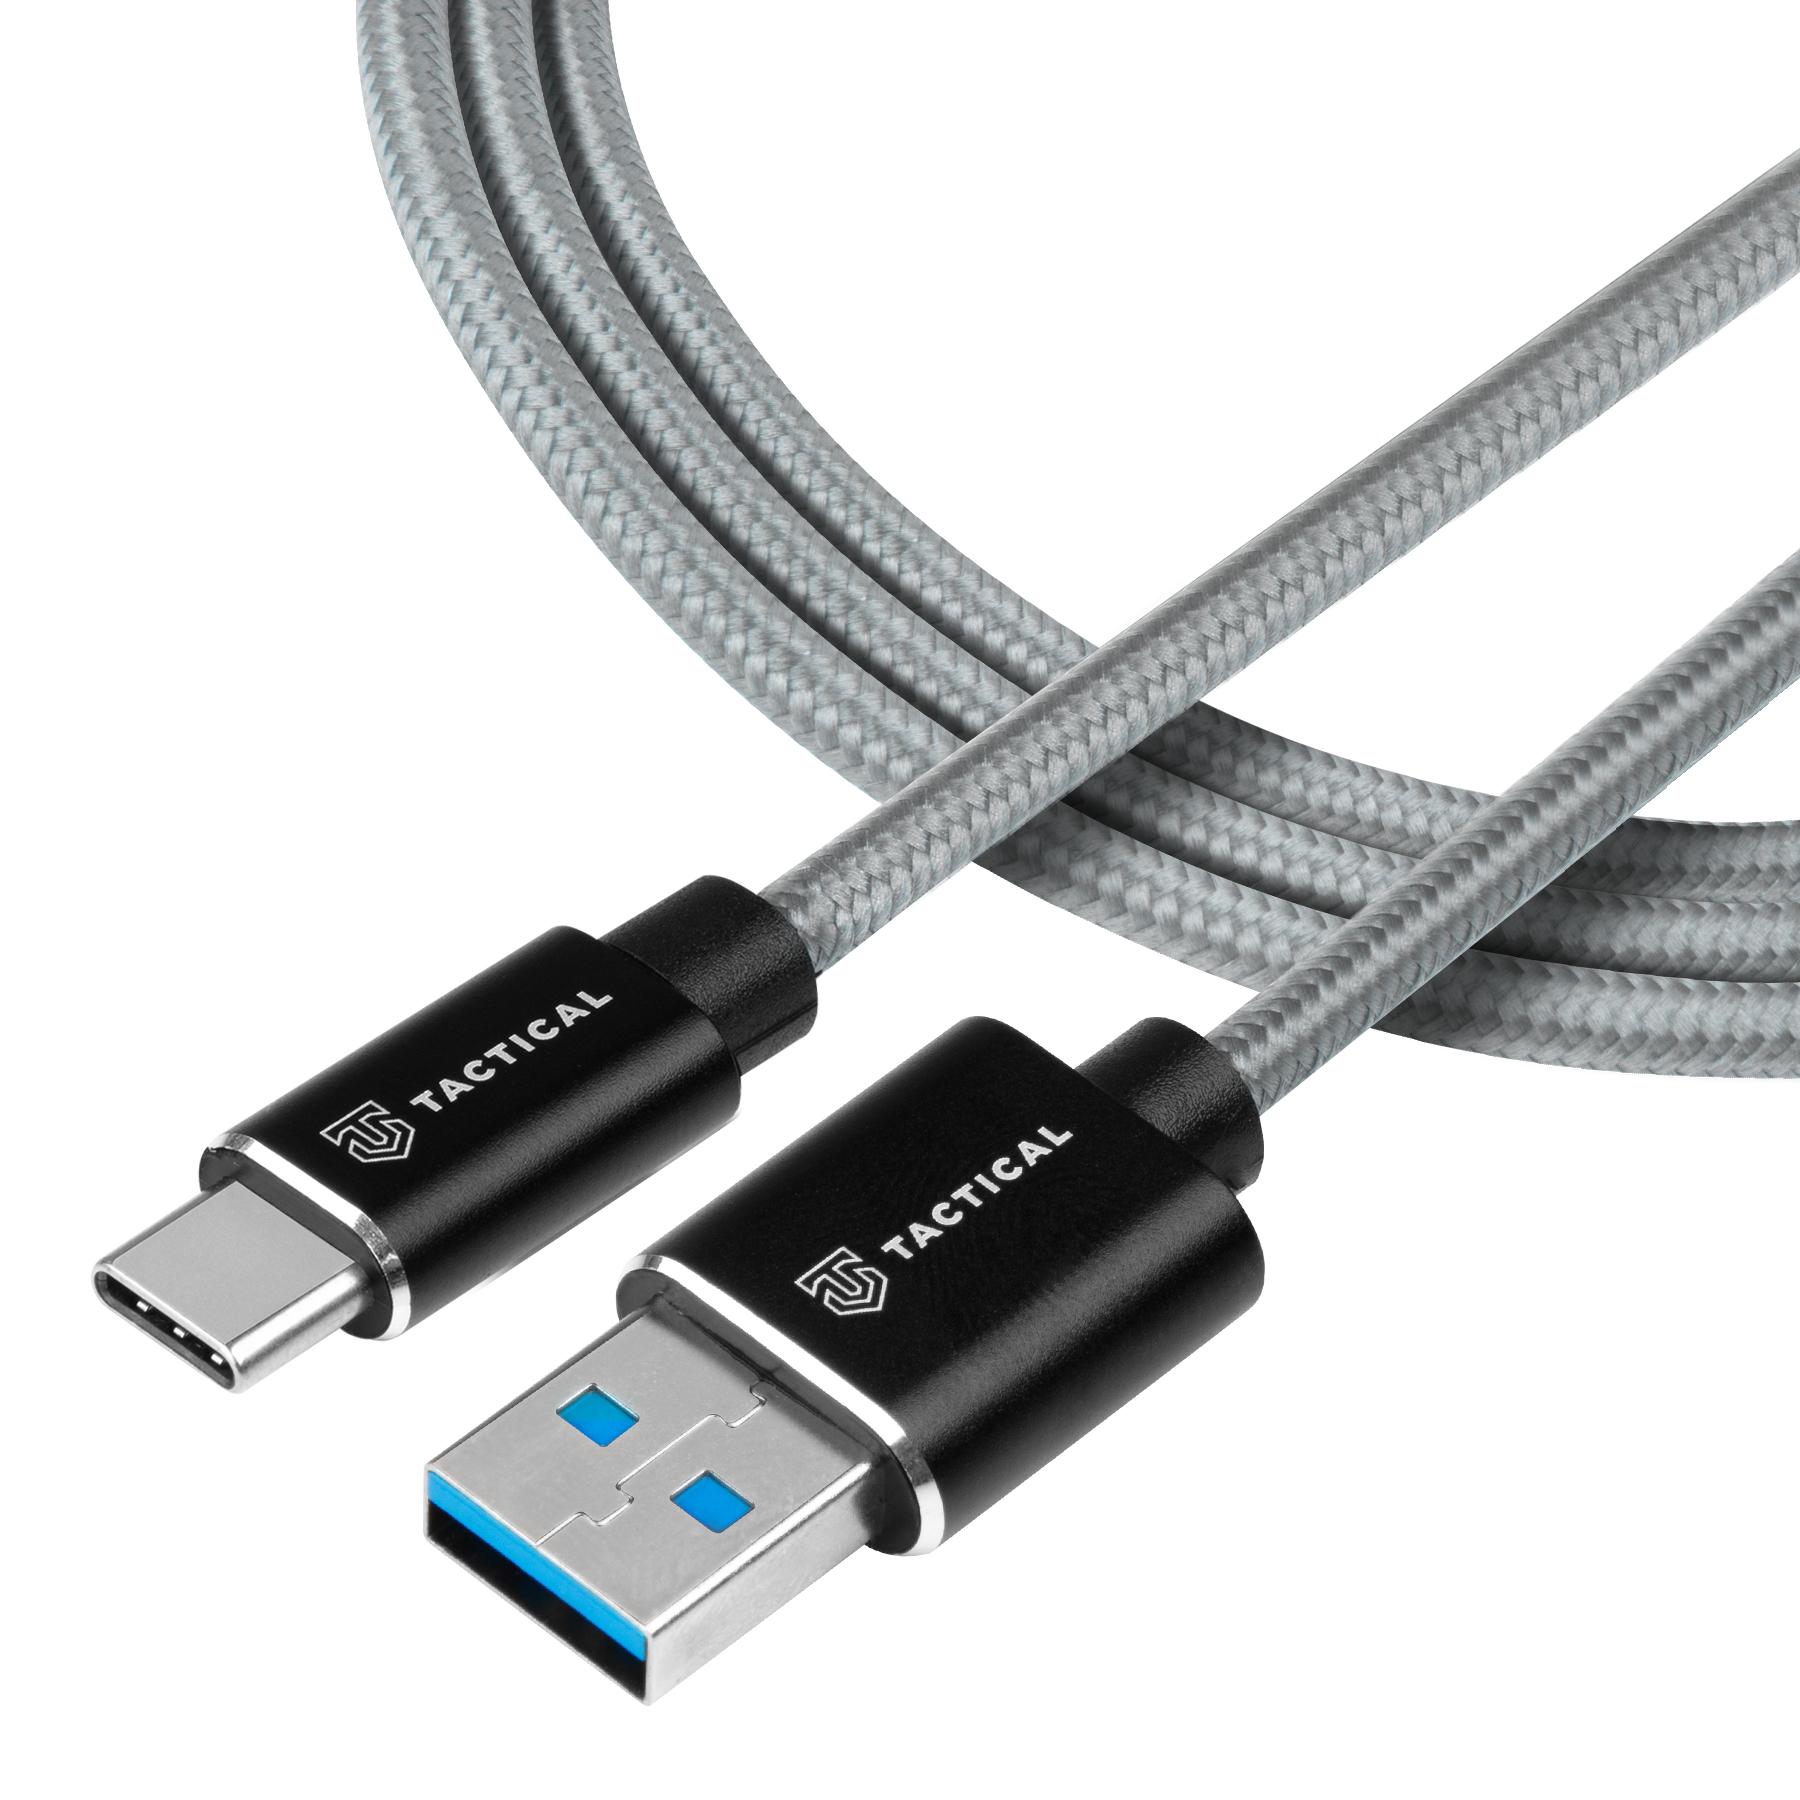 Tactical Fast Rope Aramid Cable USB-A/USB-C 1m Grey 8596311153112